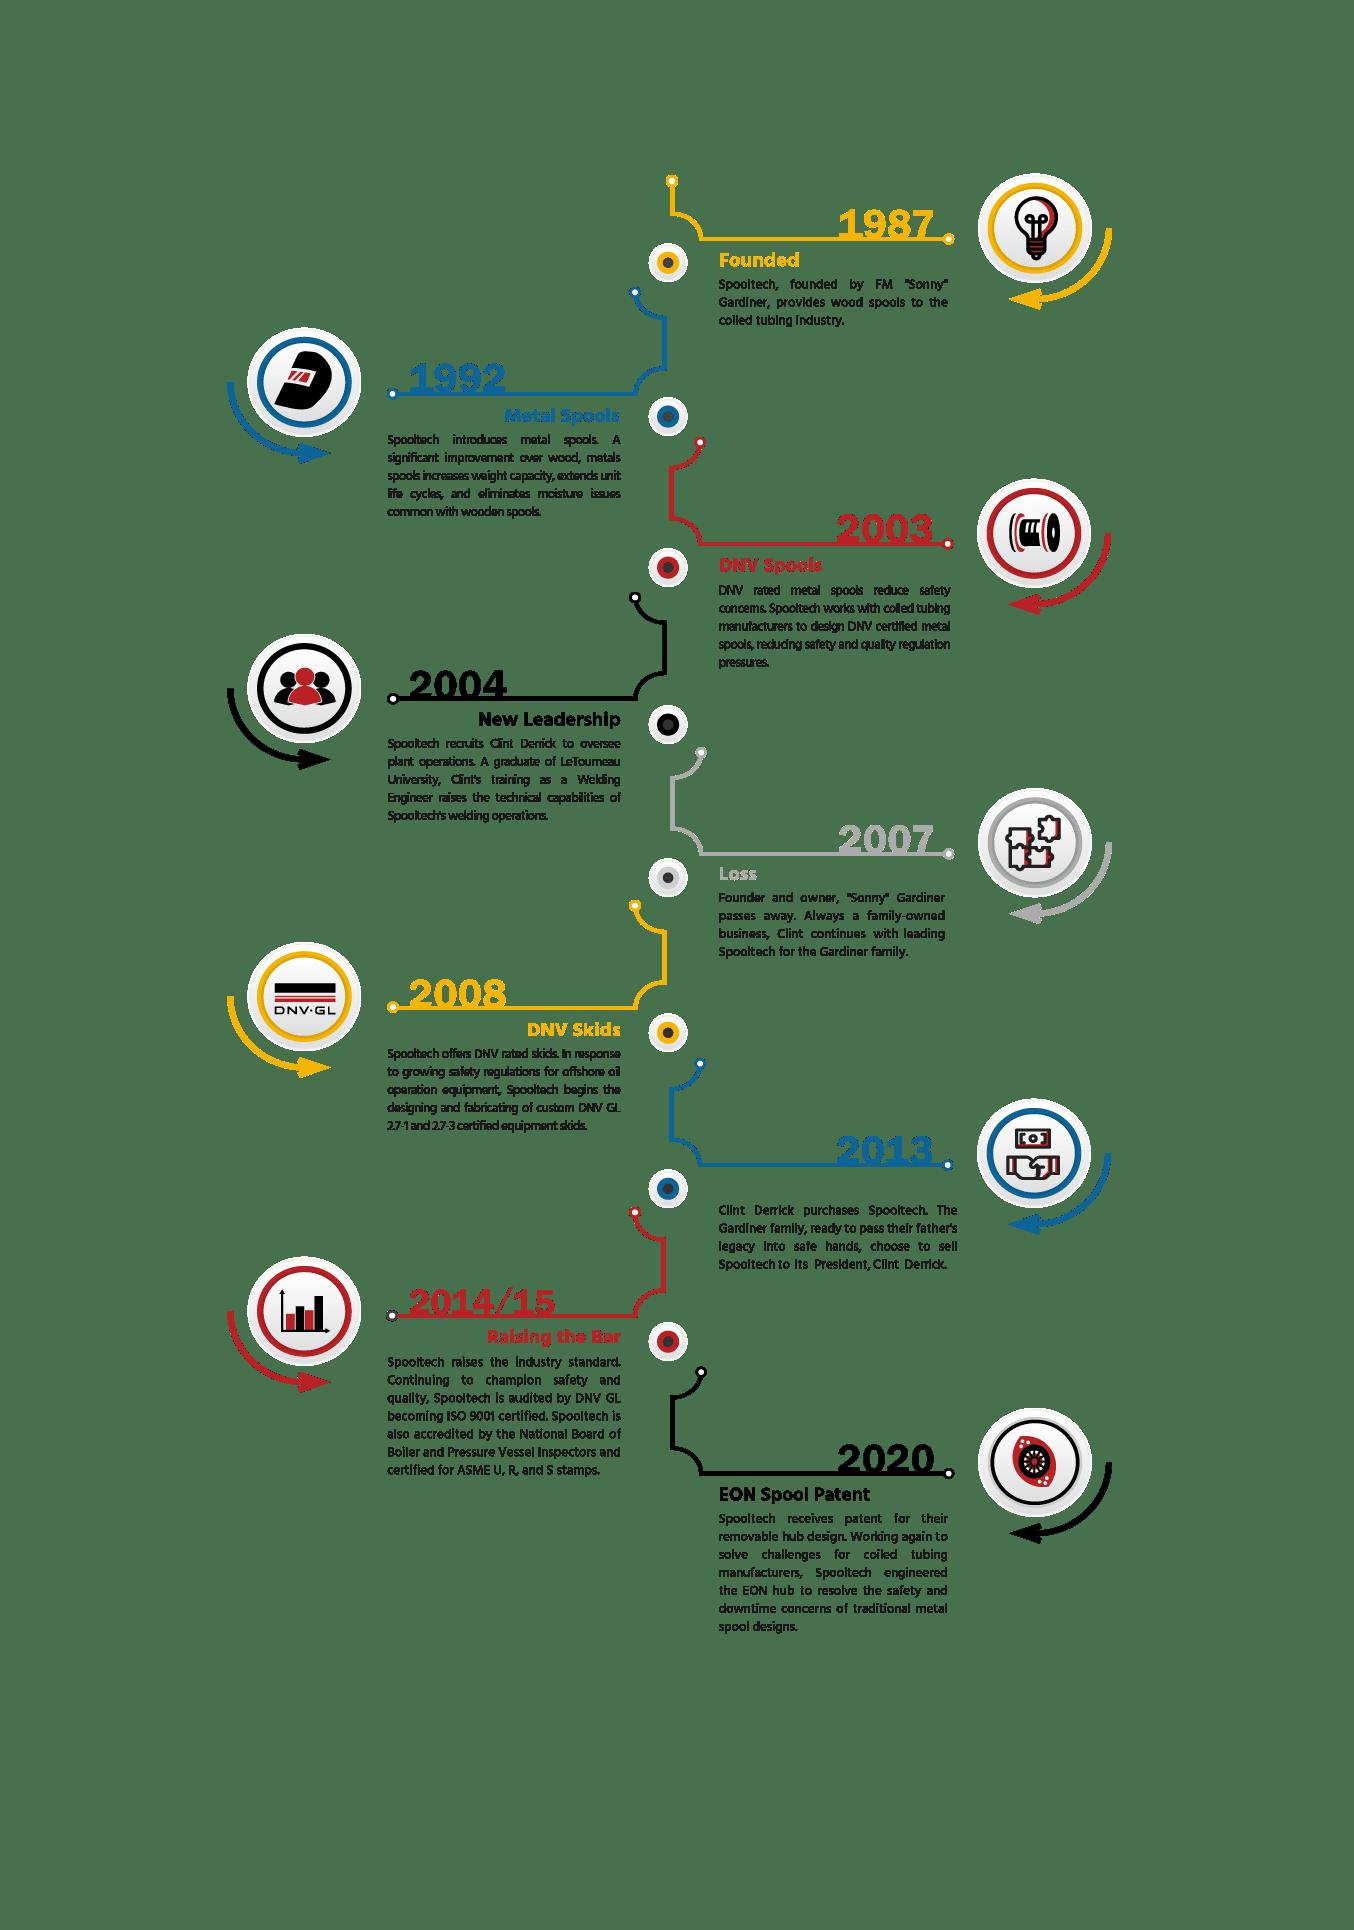 Spooltech History